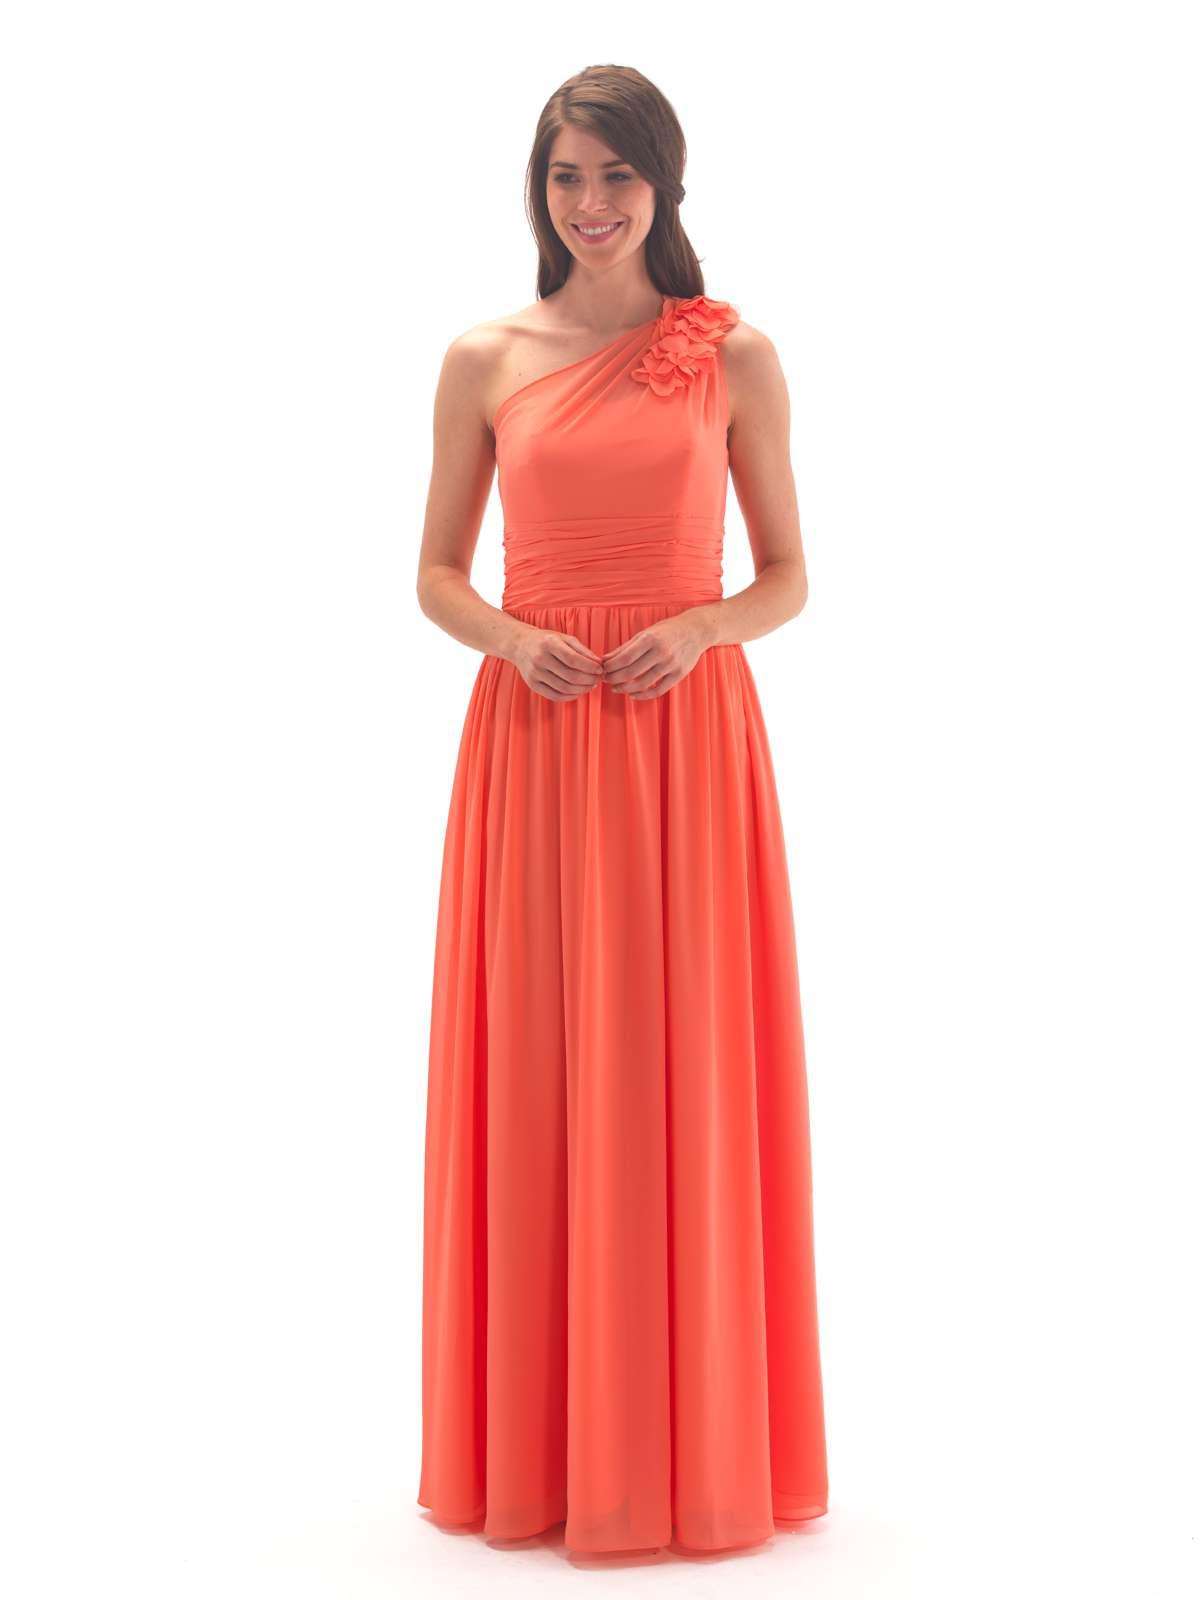 50 sensational bridesmaid dresses love our wedding linzi jay ombrellifo Images